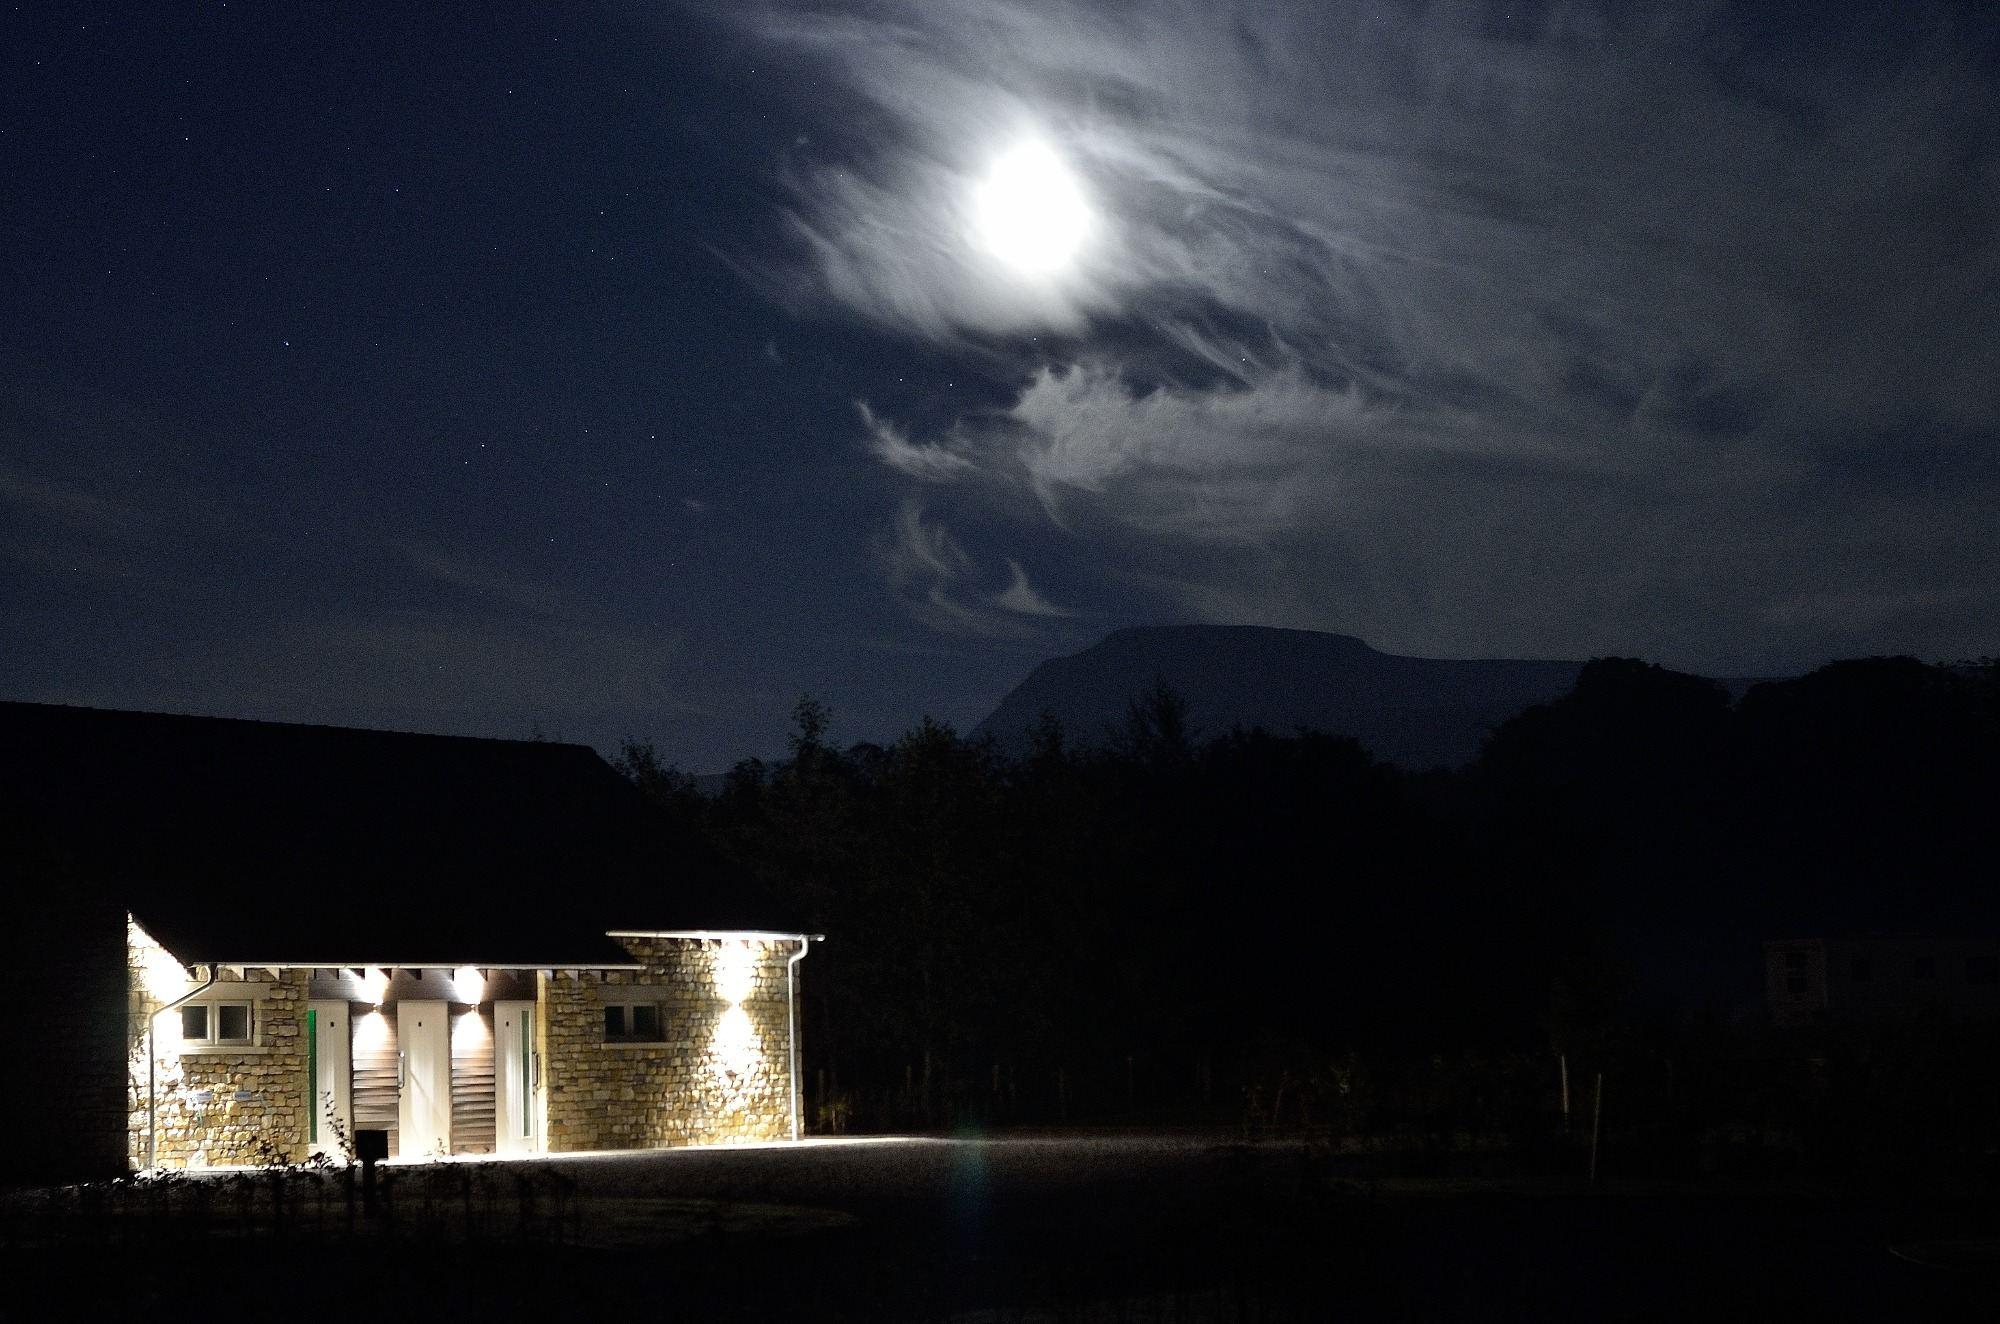 Moon & Ingleborough @ thornbrook barn (photo courtesy of Mark McInnes)